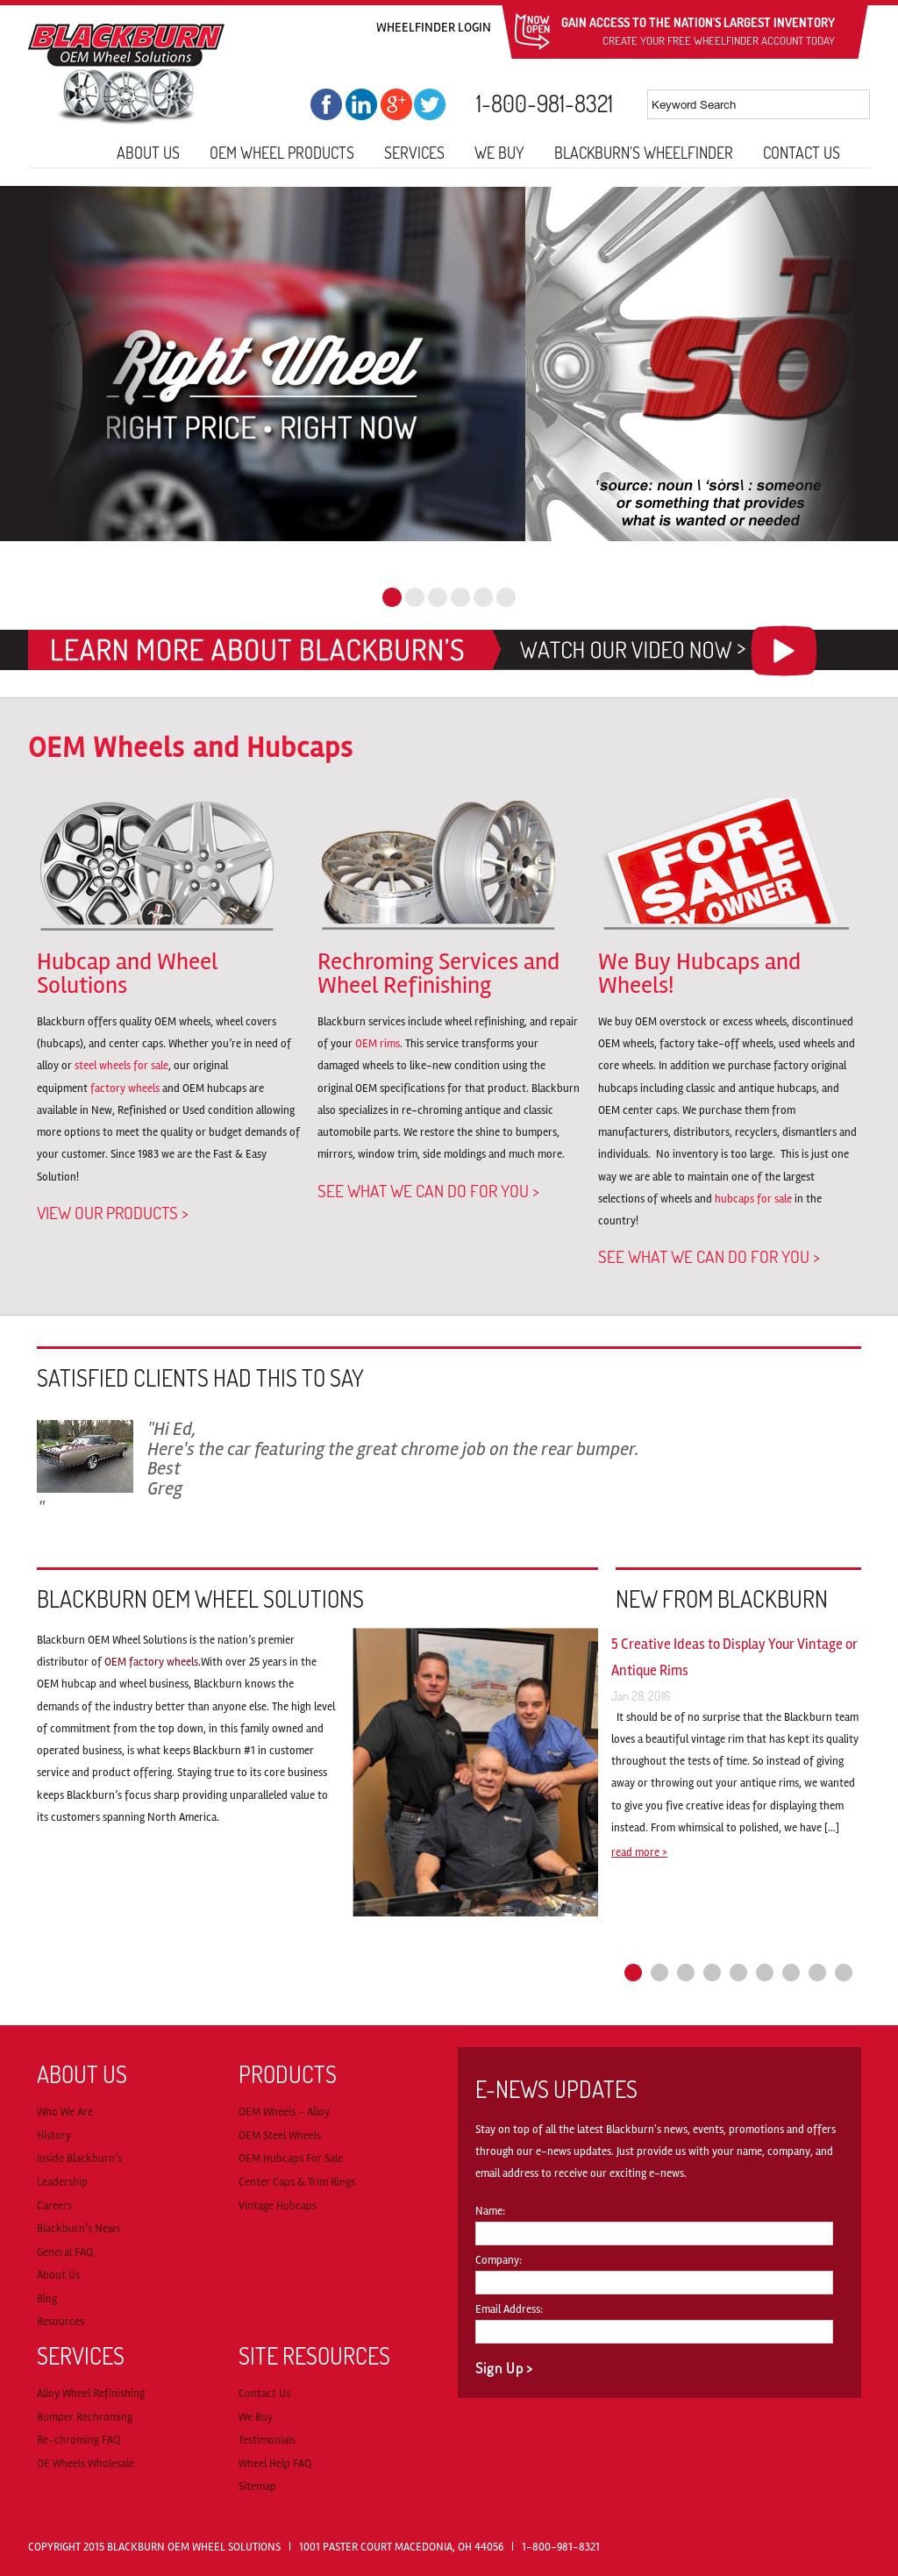 Blackburnwheels Competitors, Revenue and Employees - Owler